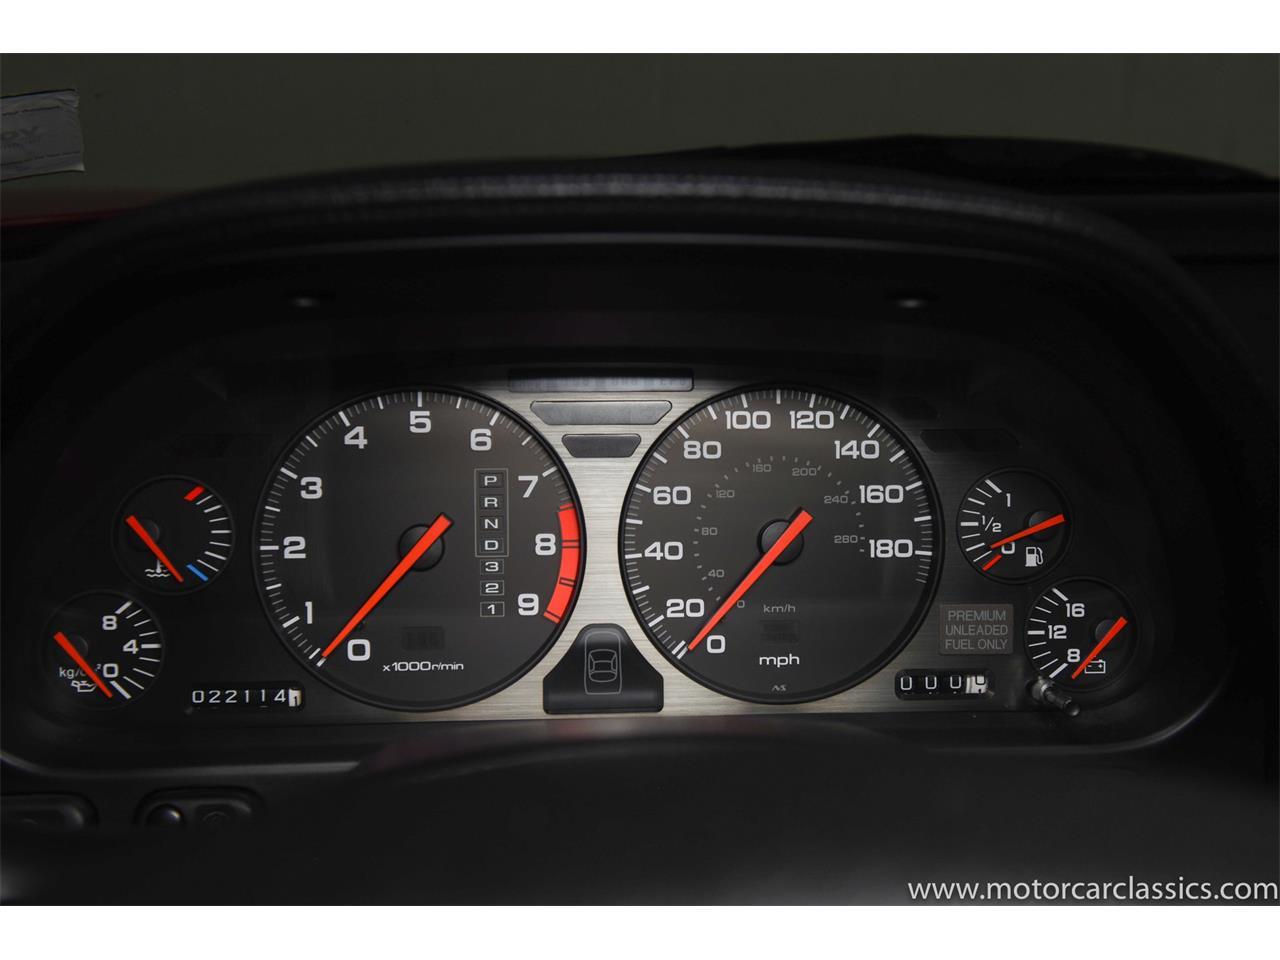 1991 Acura NSX (CC-1243906) for sale in Farmingdale, New York